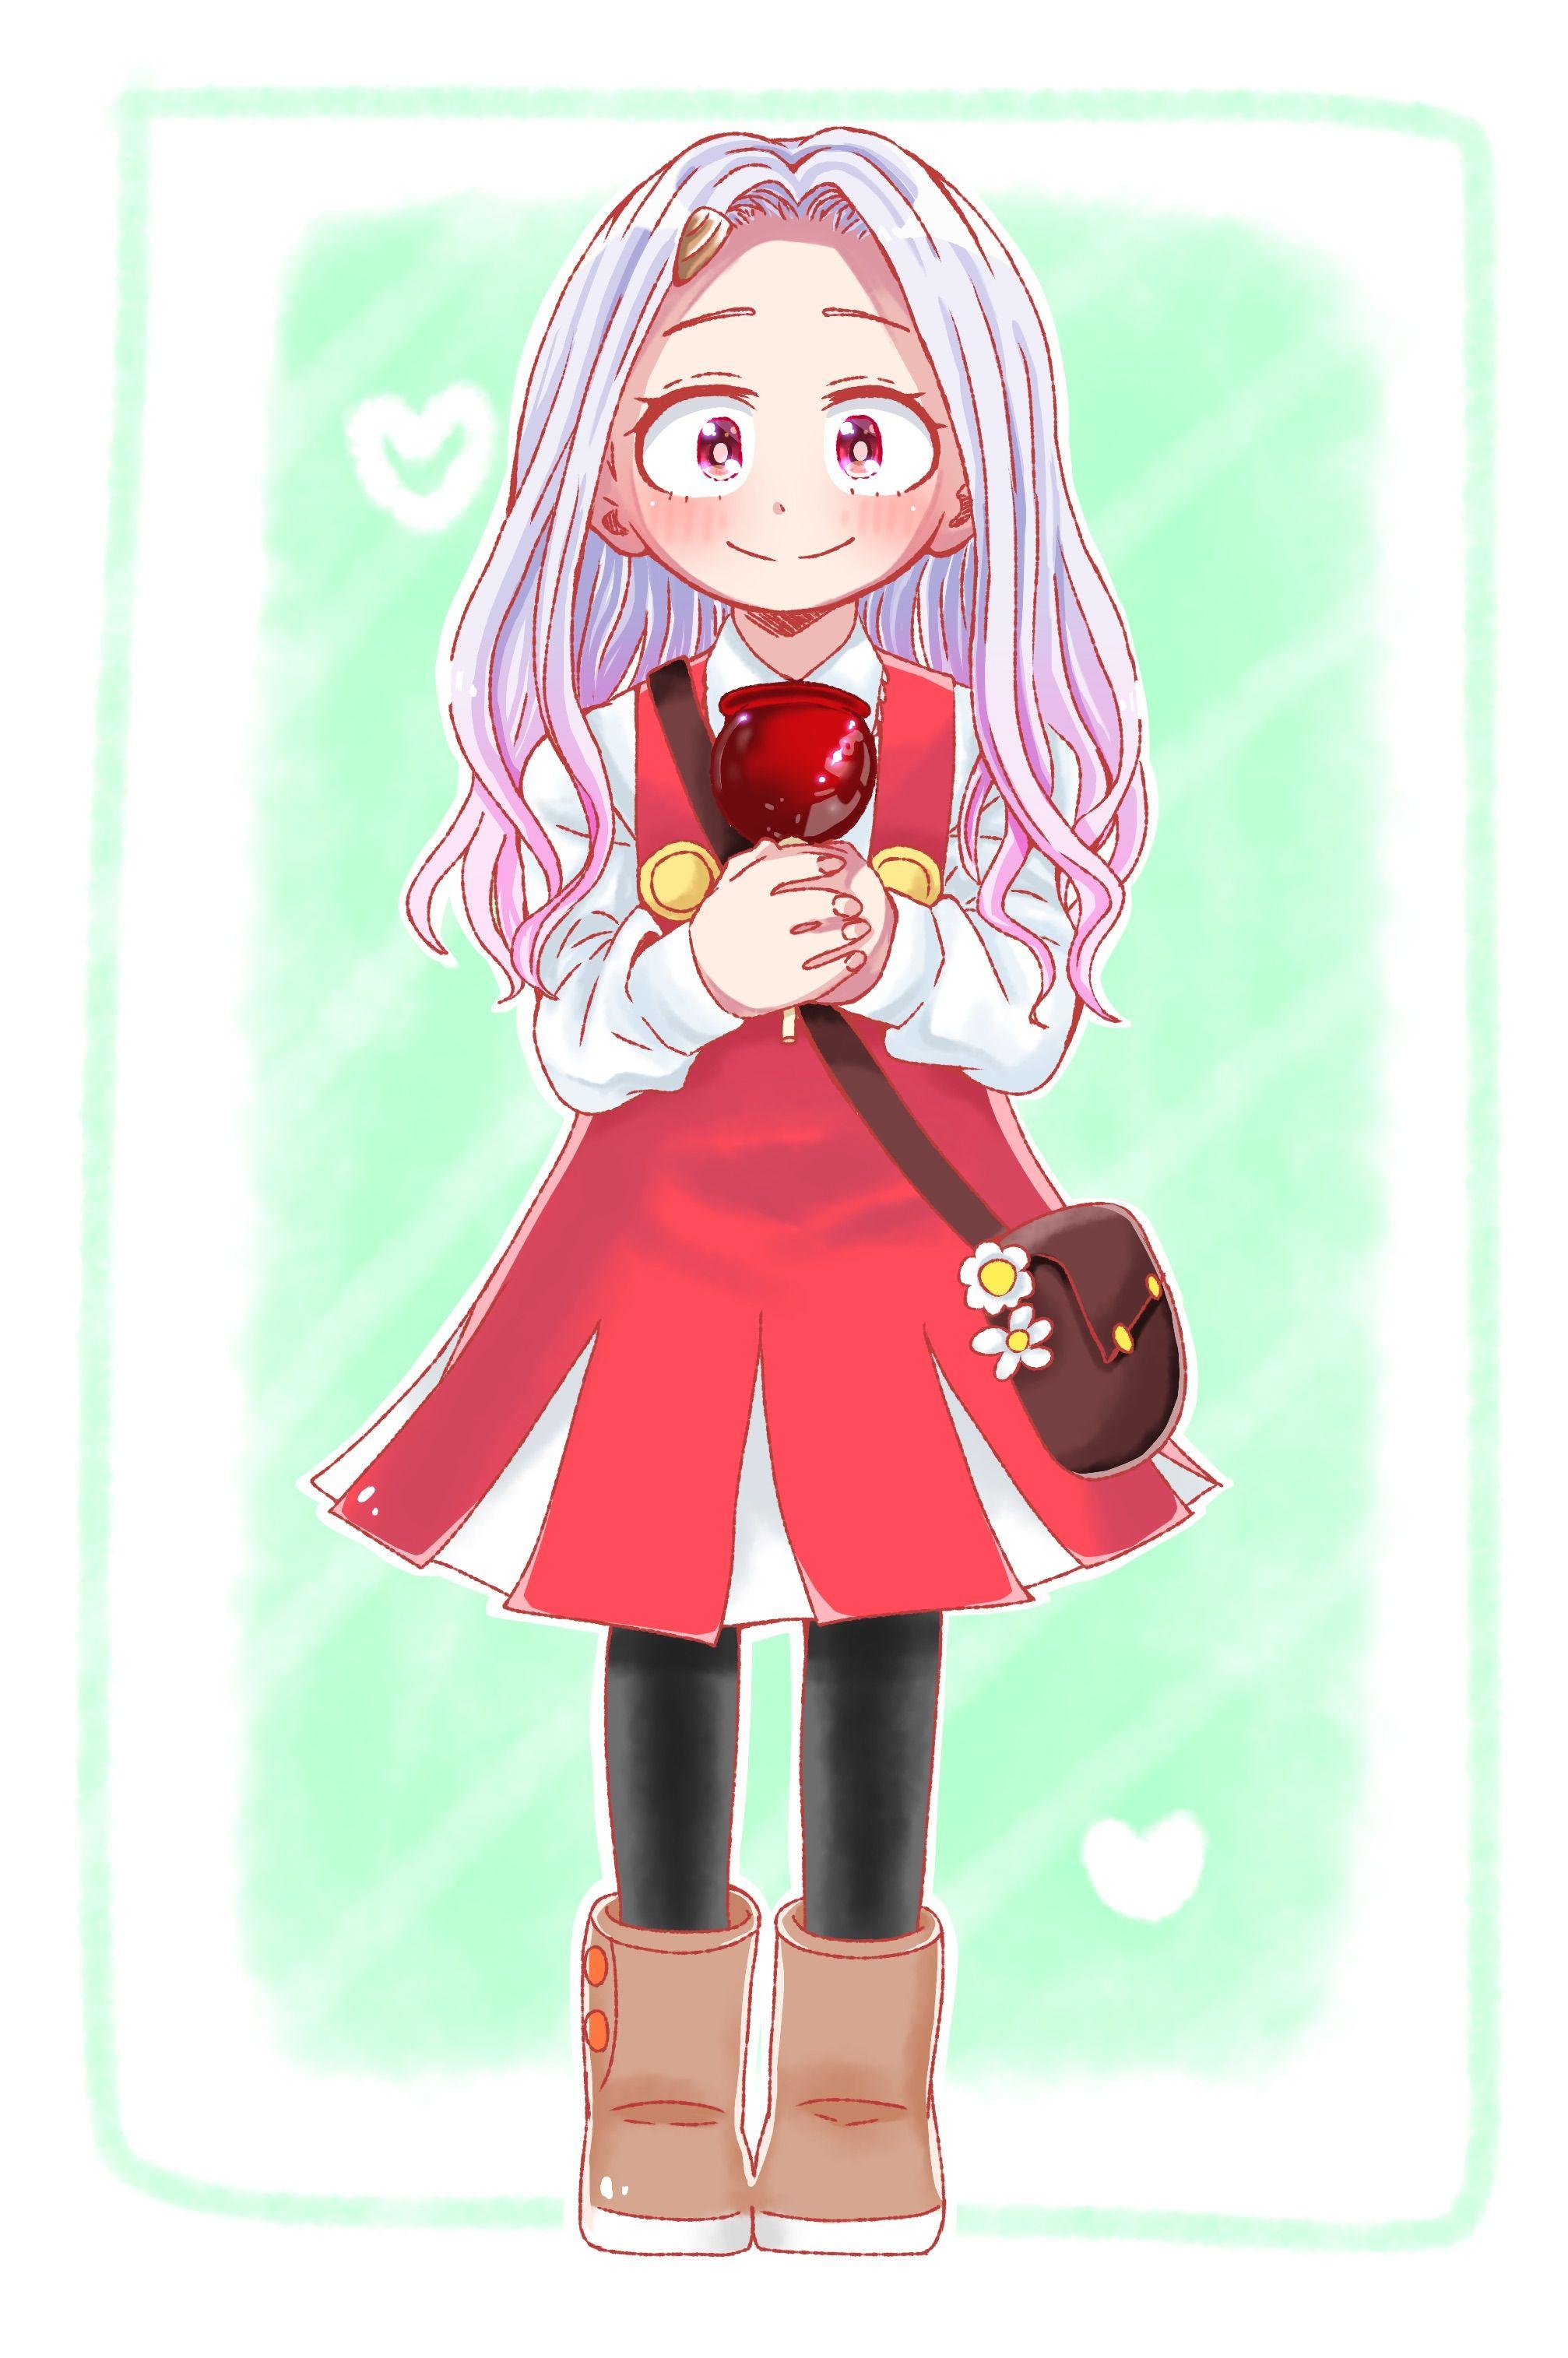 Eri Boku No Hero Academia My Hero Academia Episodes Anime Hero Wallpaper